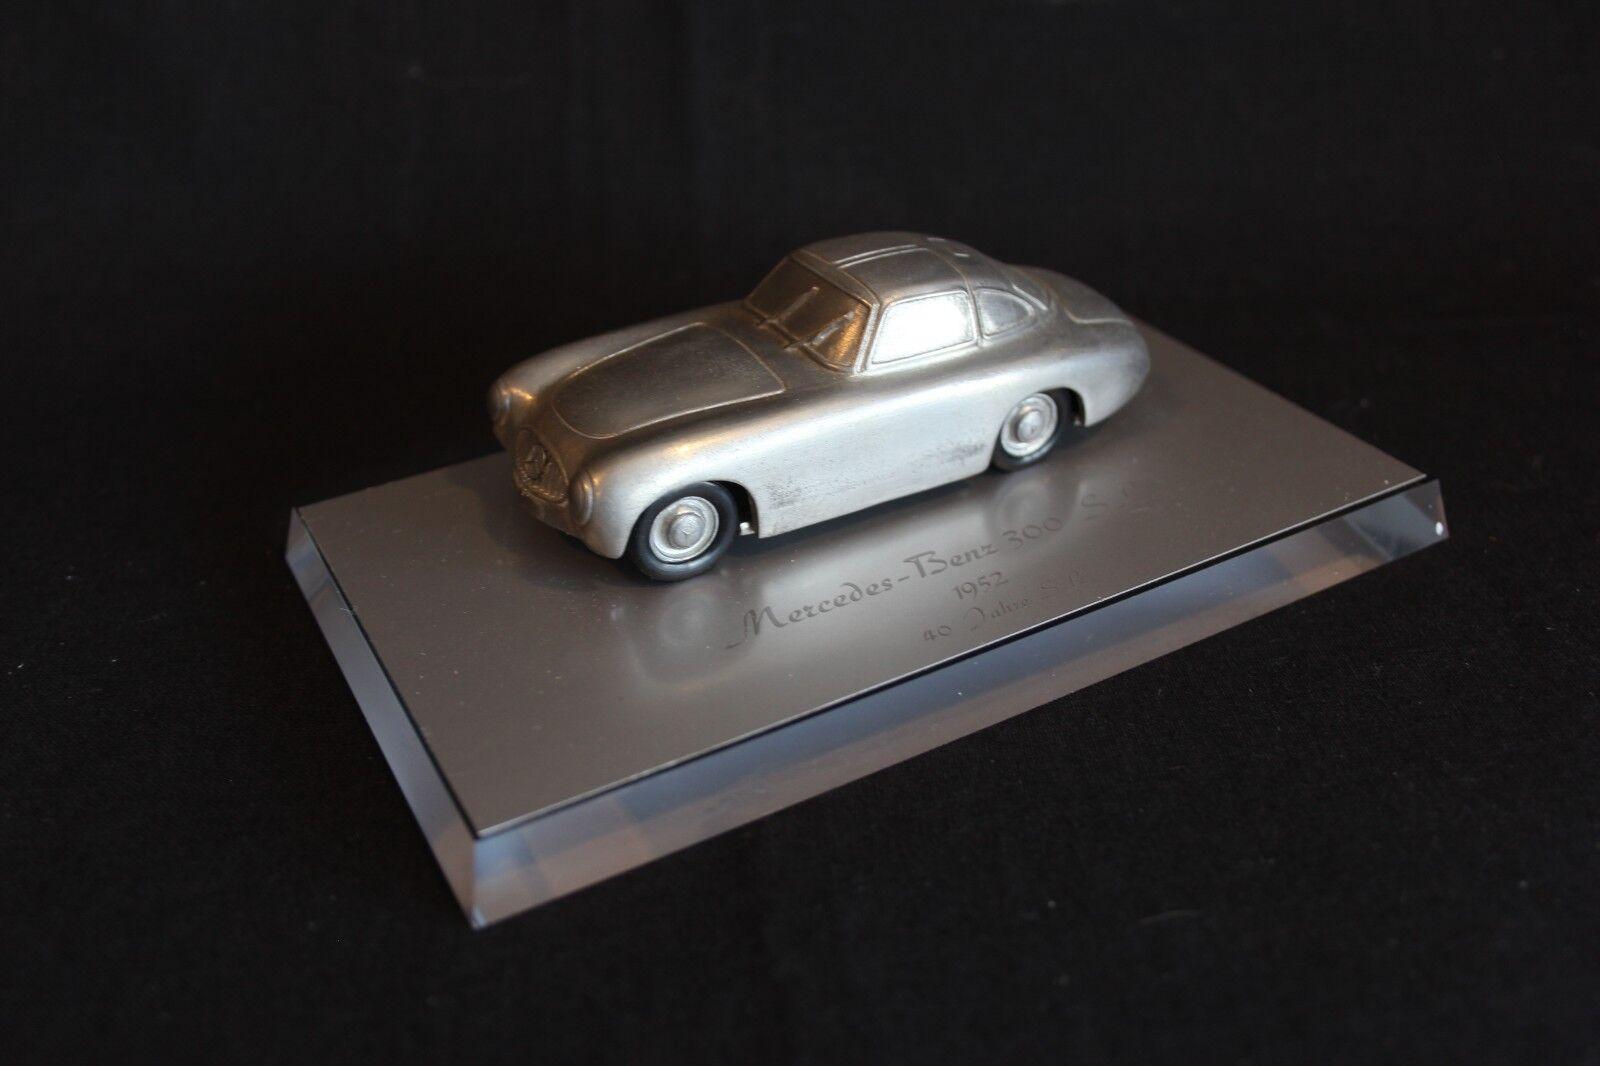 AMR Mercedes-Benz 300 SL 1952 1 43  40 Jahre SL  (JS)